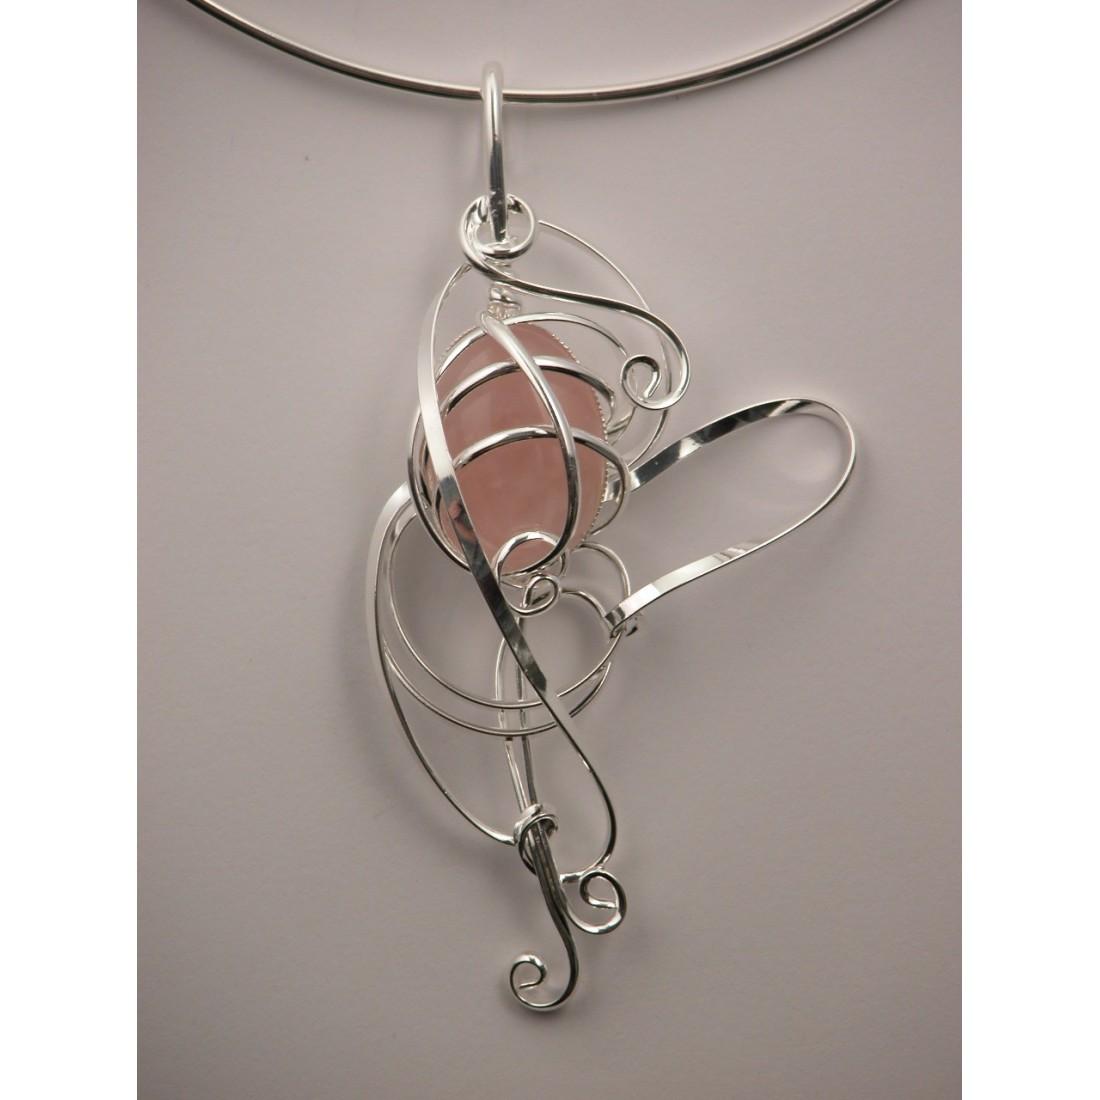 Bijou artisanal, collier avec quartz rose